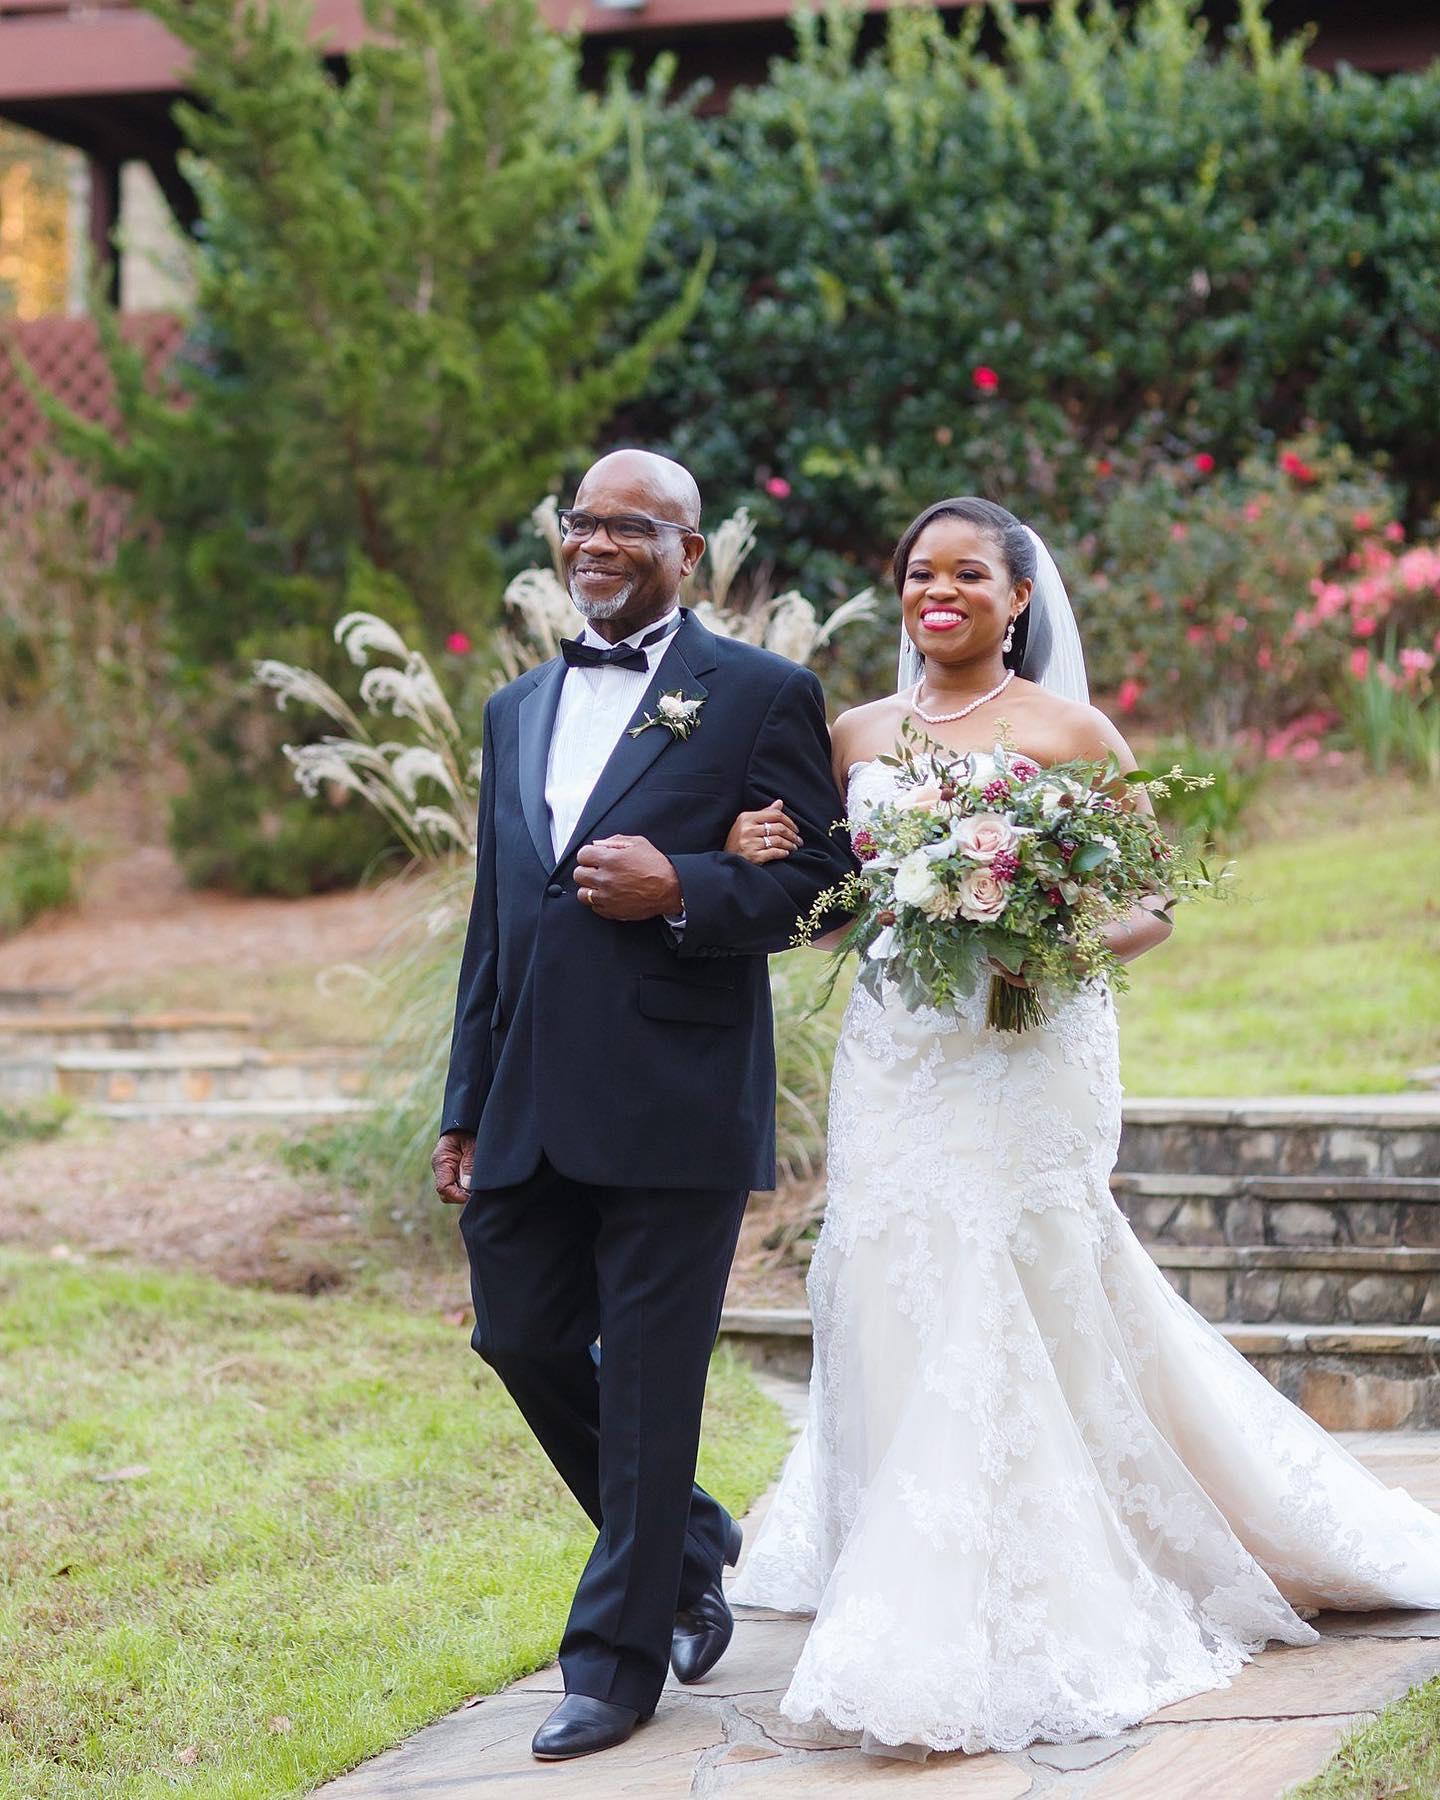 Here comes the bride! ❤️